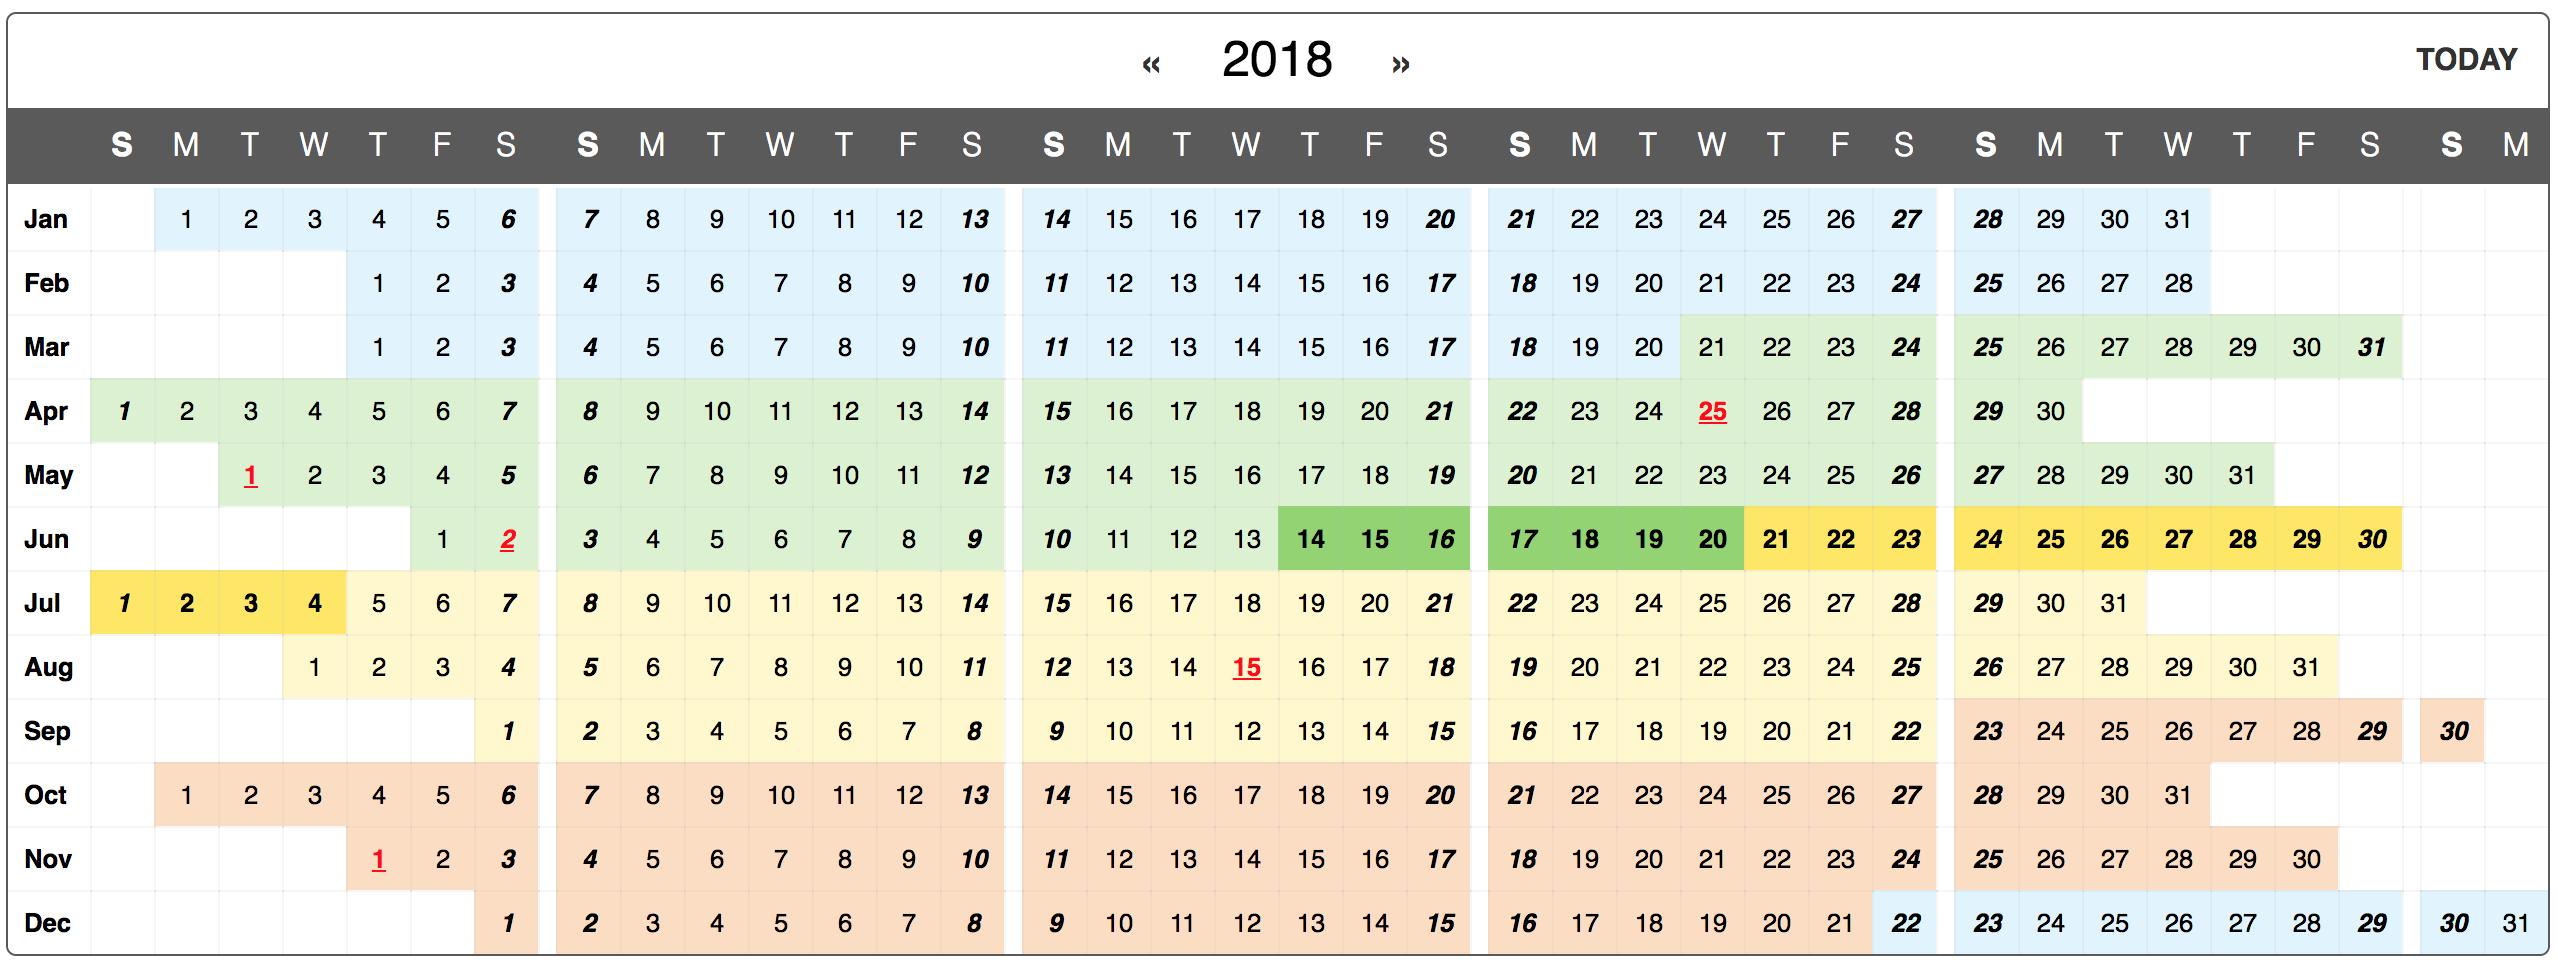 http://belkalab.github.io/react-yearly-calendar/